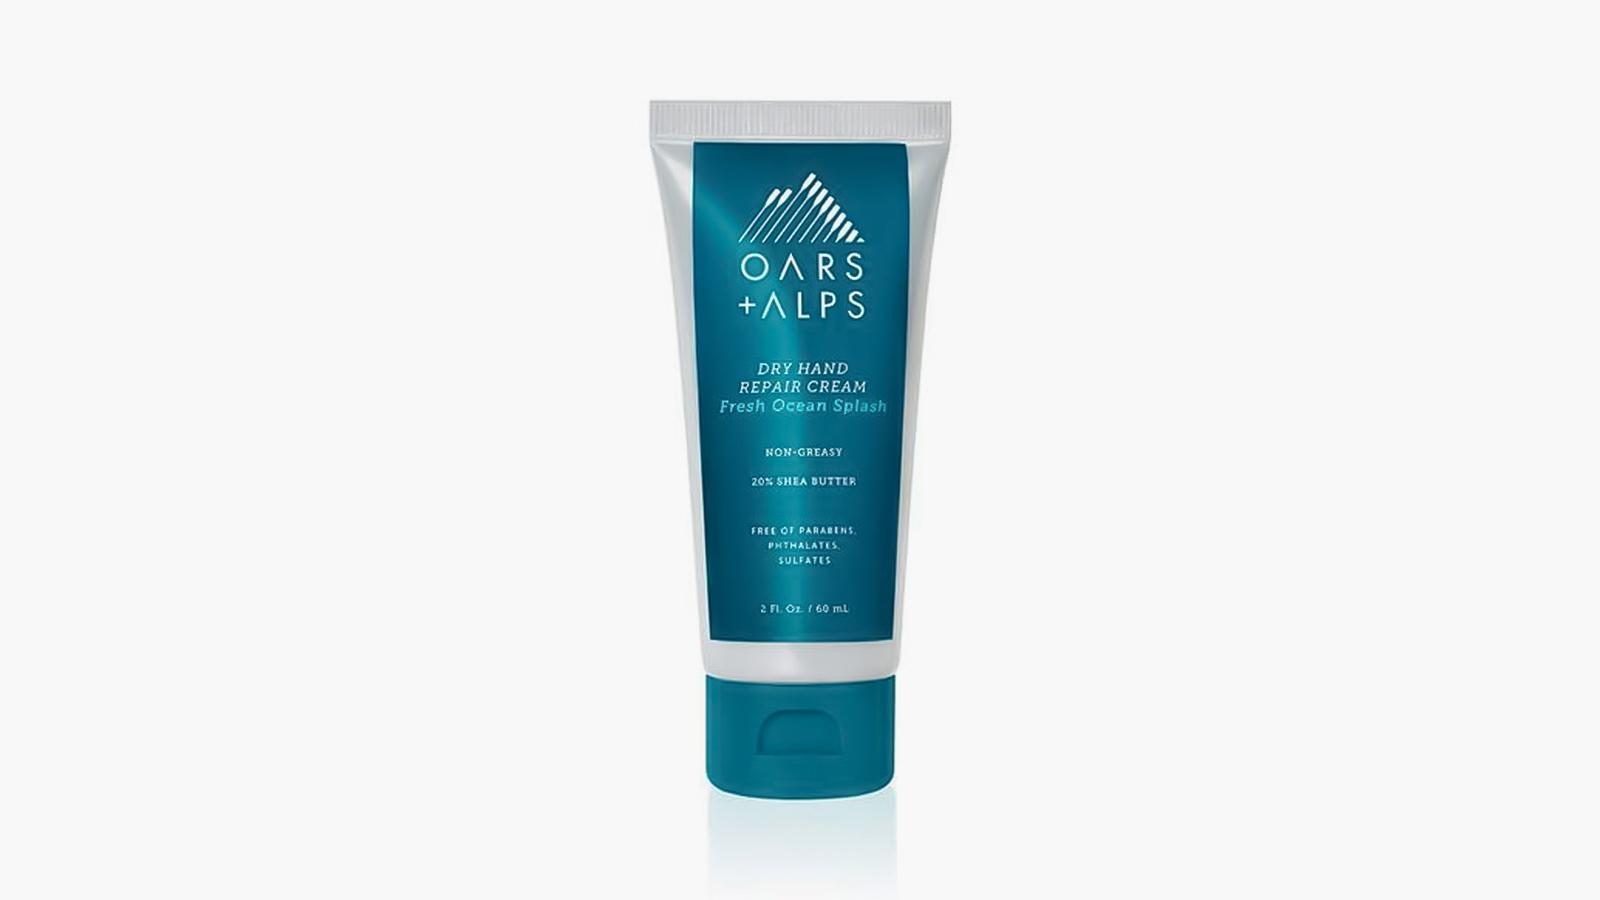 Oars + Alps Dry Hand Repair Cream